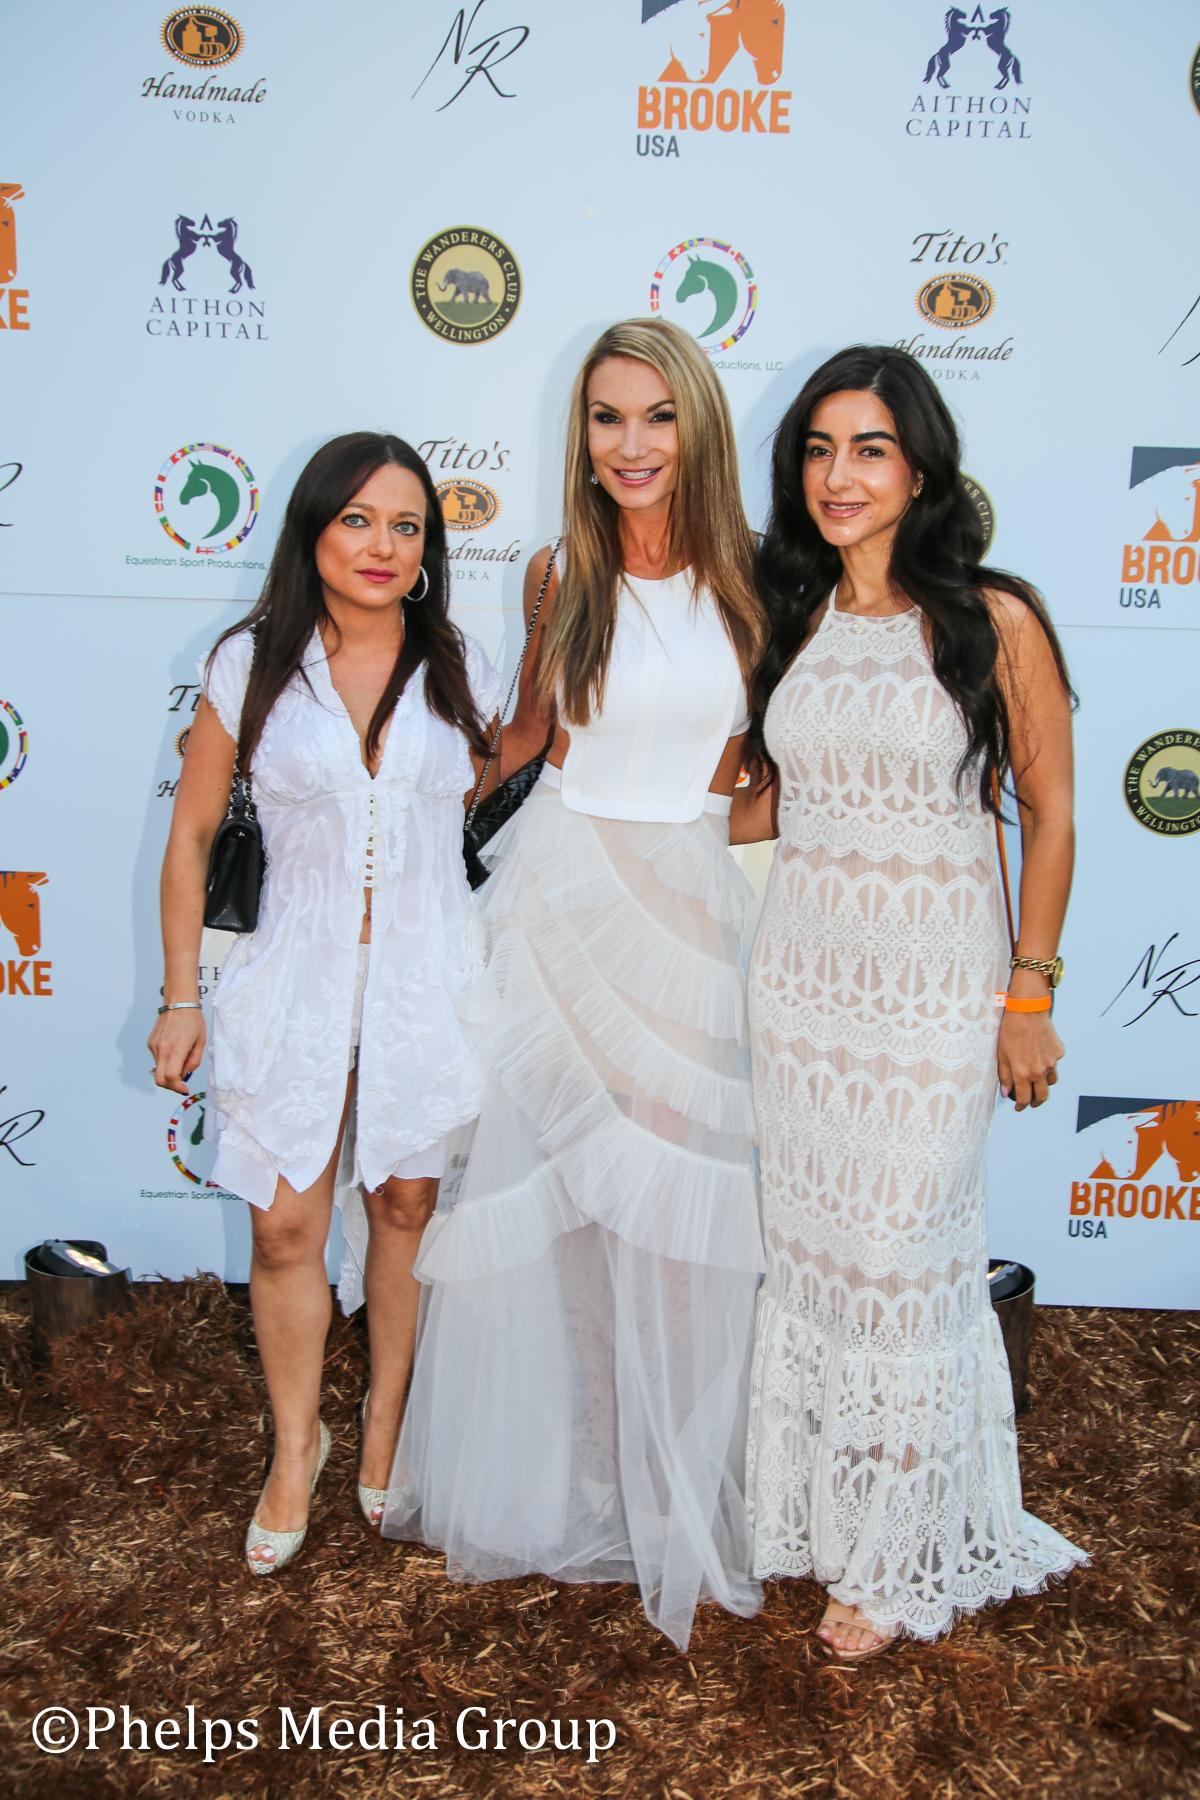 Lana Sukhman Christina Sagman and Rema Nagi; Nic Roldan's 2nd Annual Sunset Polo & White Party, FL, by Phelps Media.jpg